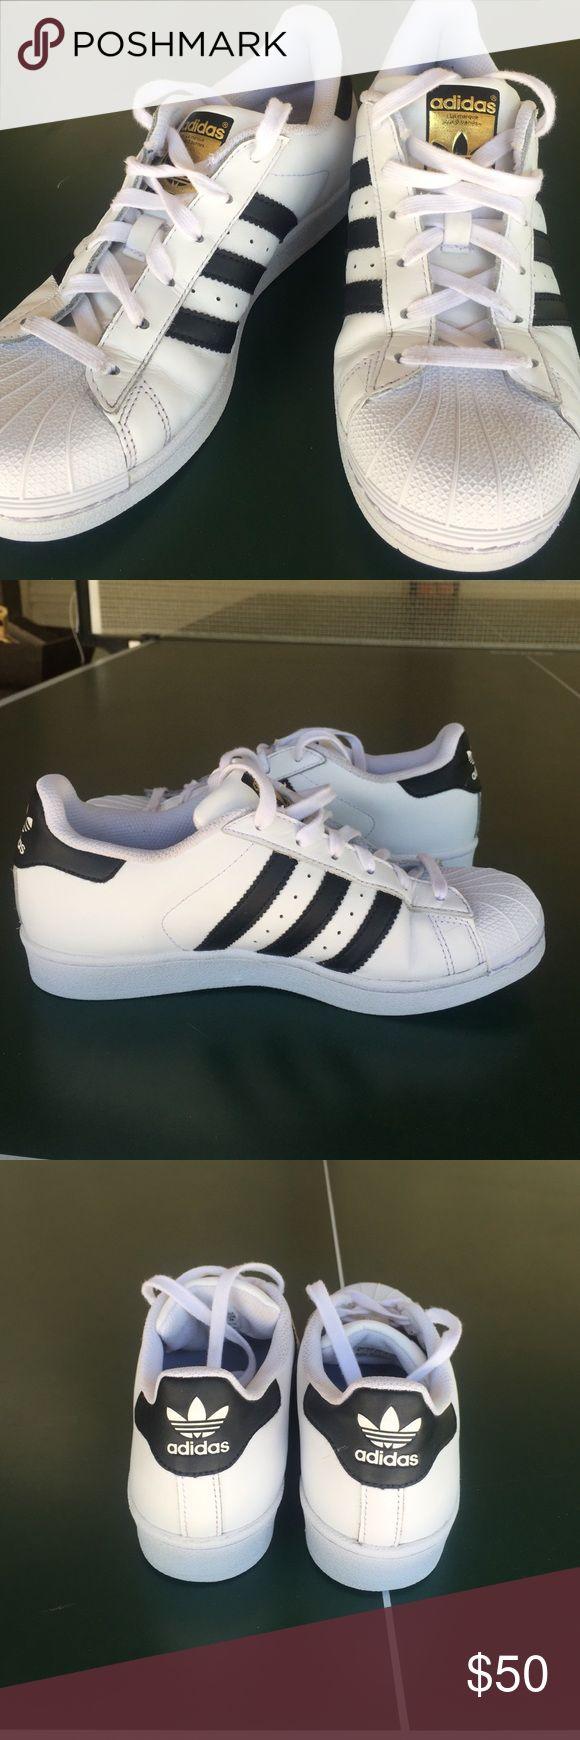 adidas shoes for girls size 3 big girls in black adidas gazelle 2016 black on feet